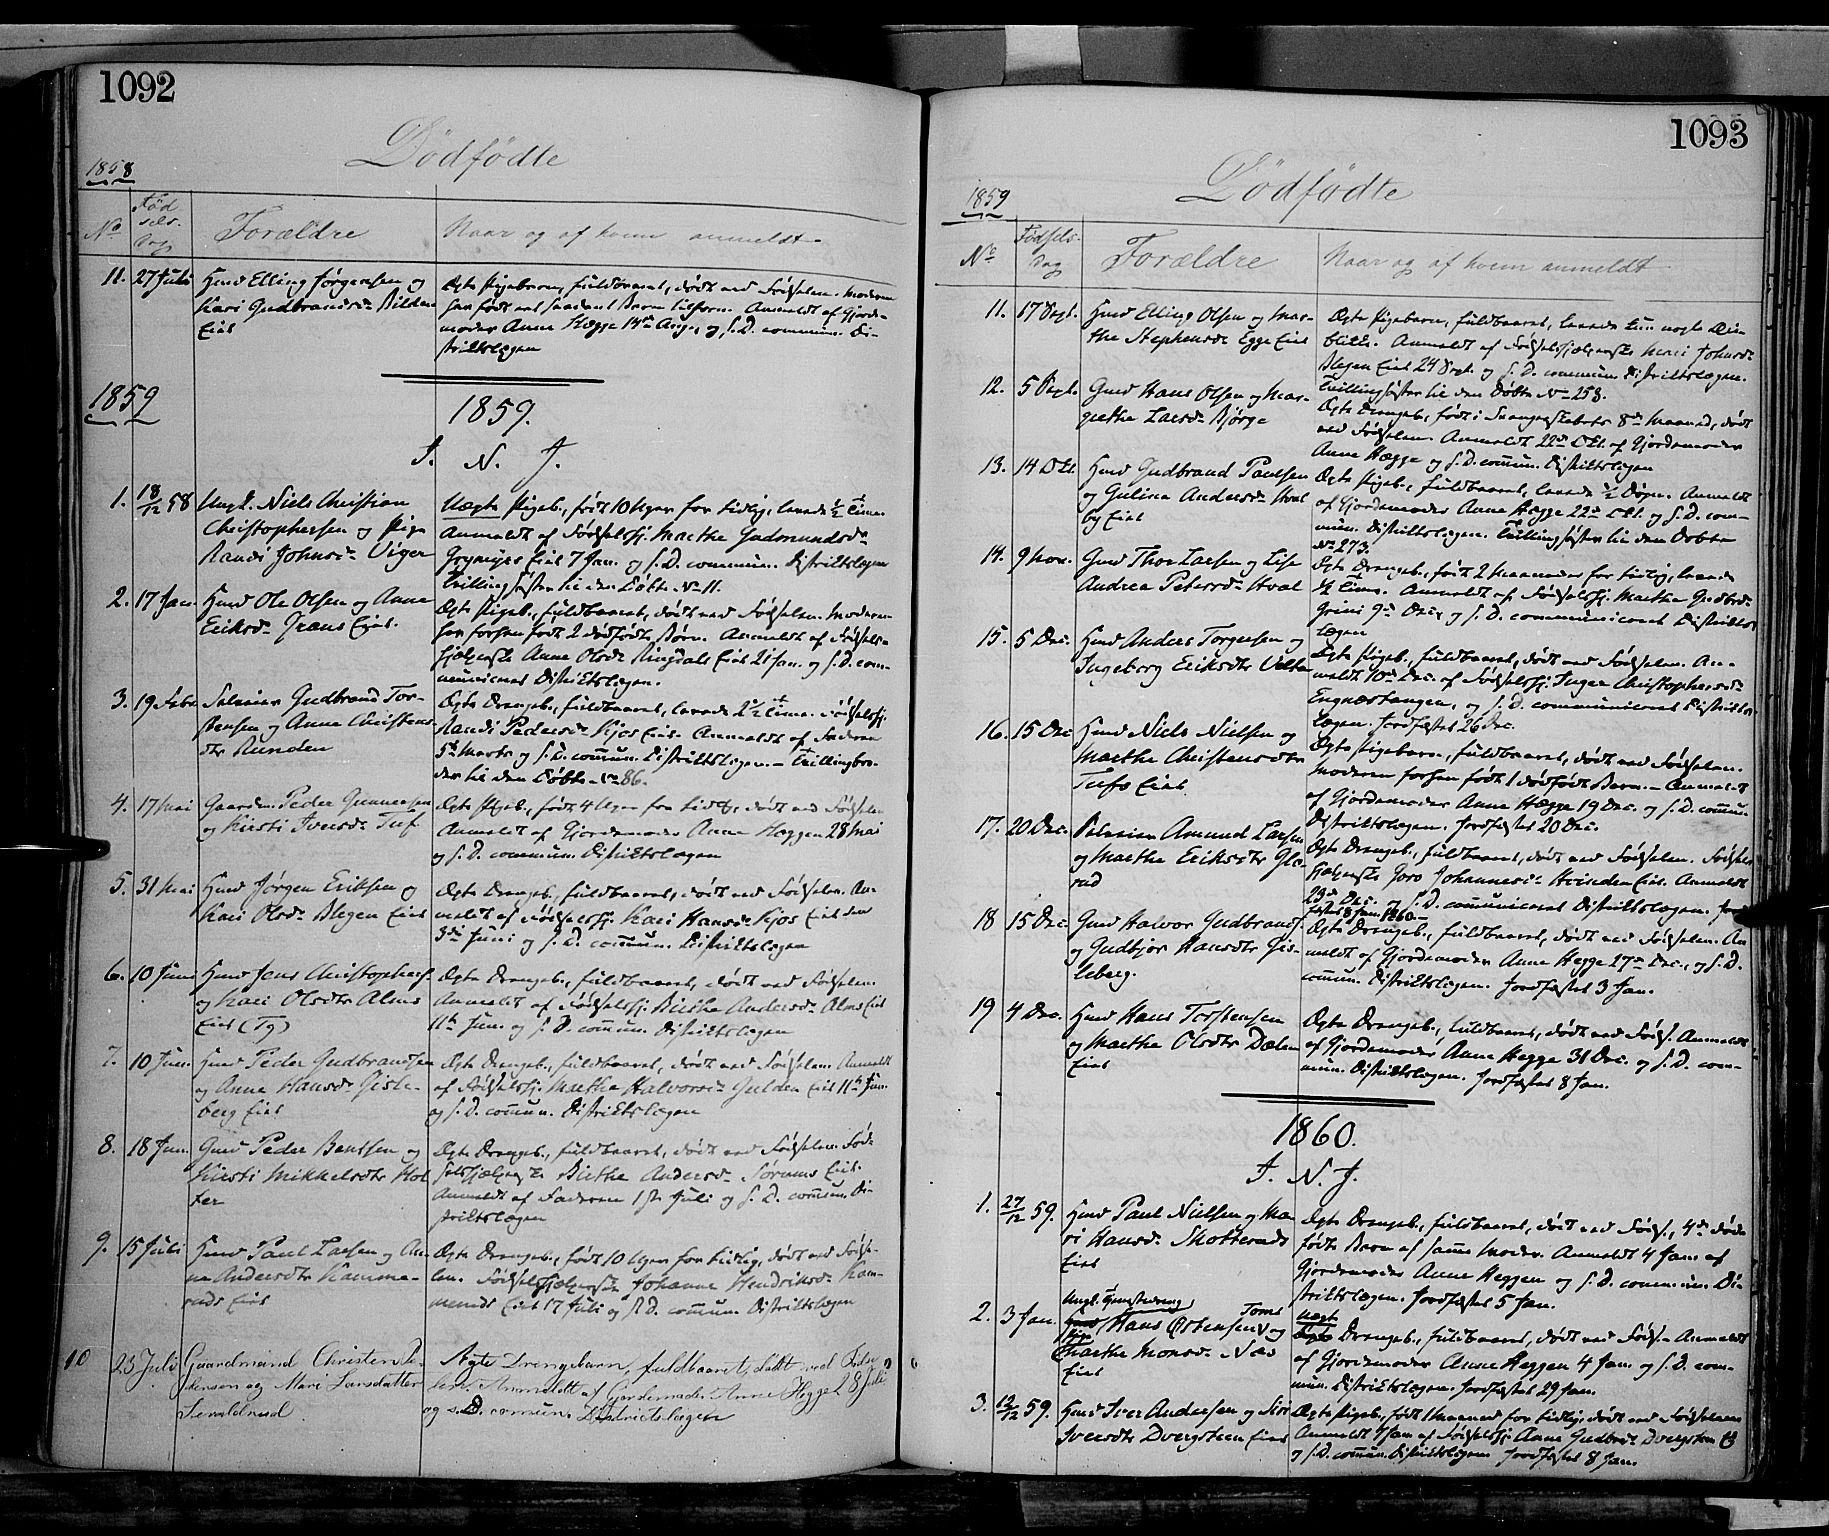 SAH, Gran prestekontor, Ministerialbok nr. 12, 1856-1874, s. 1092-1093